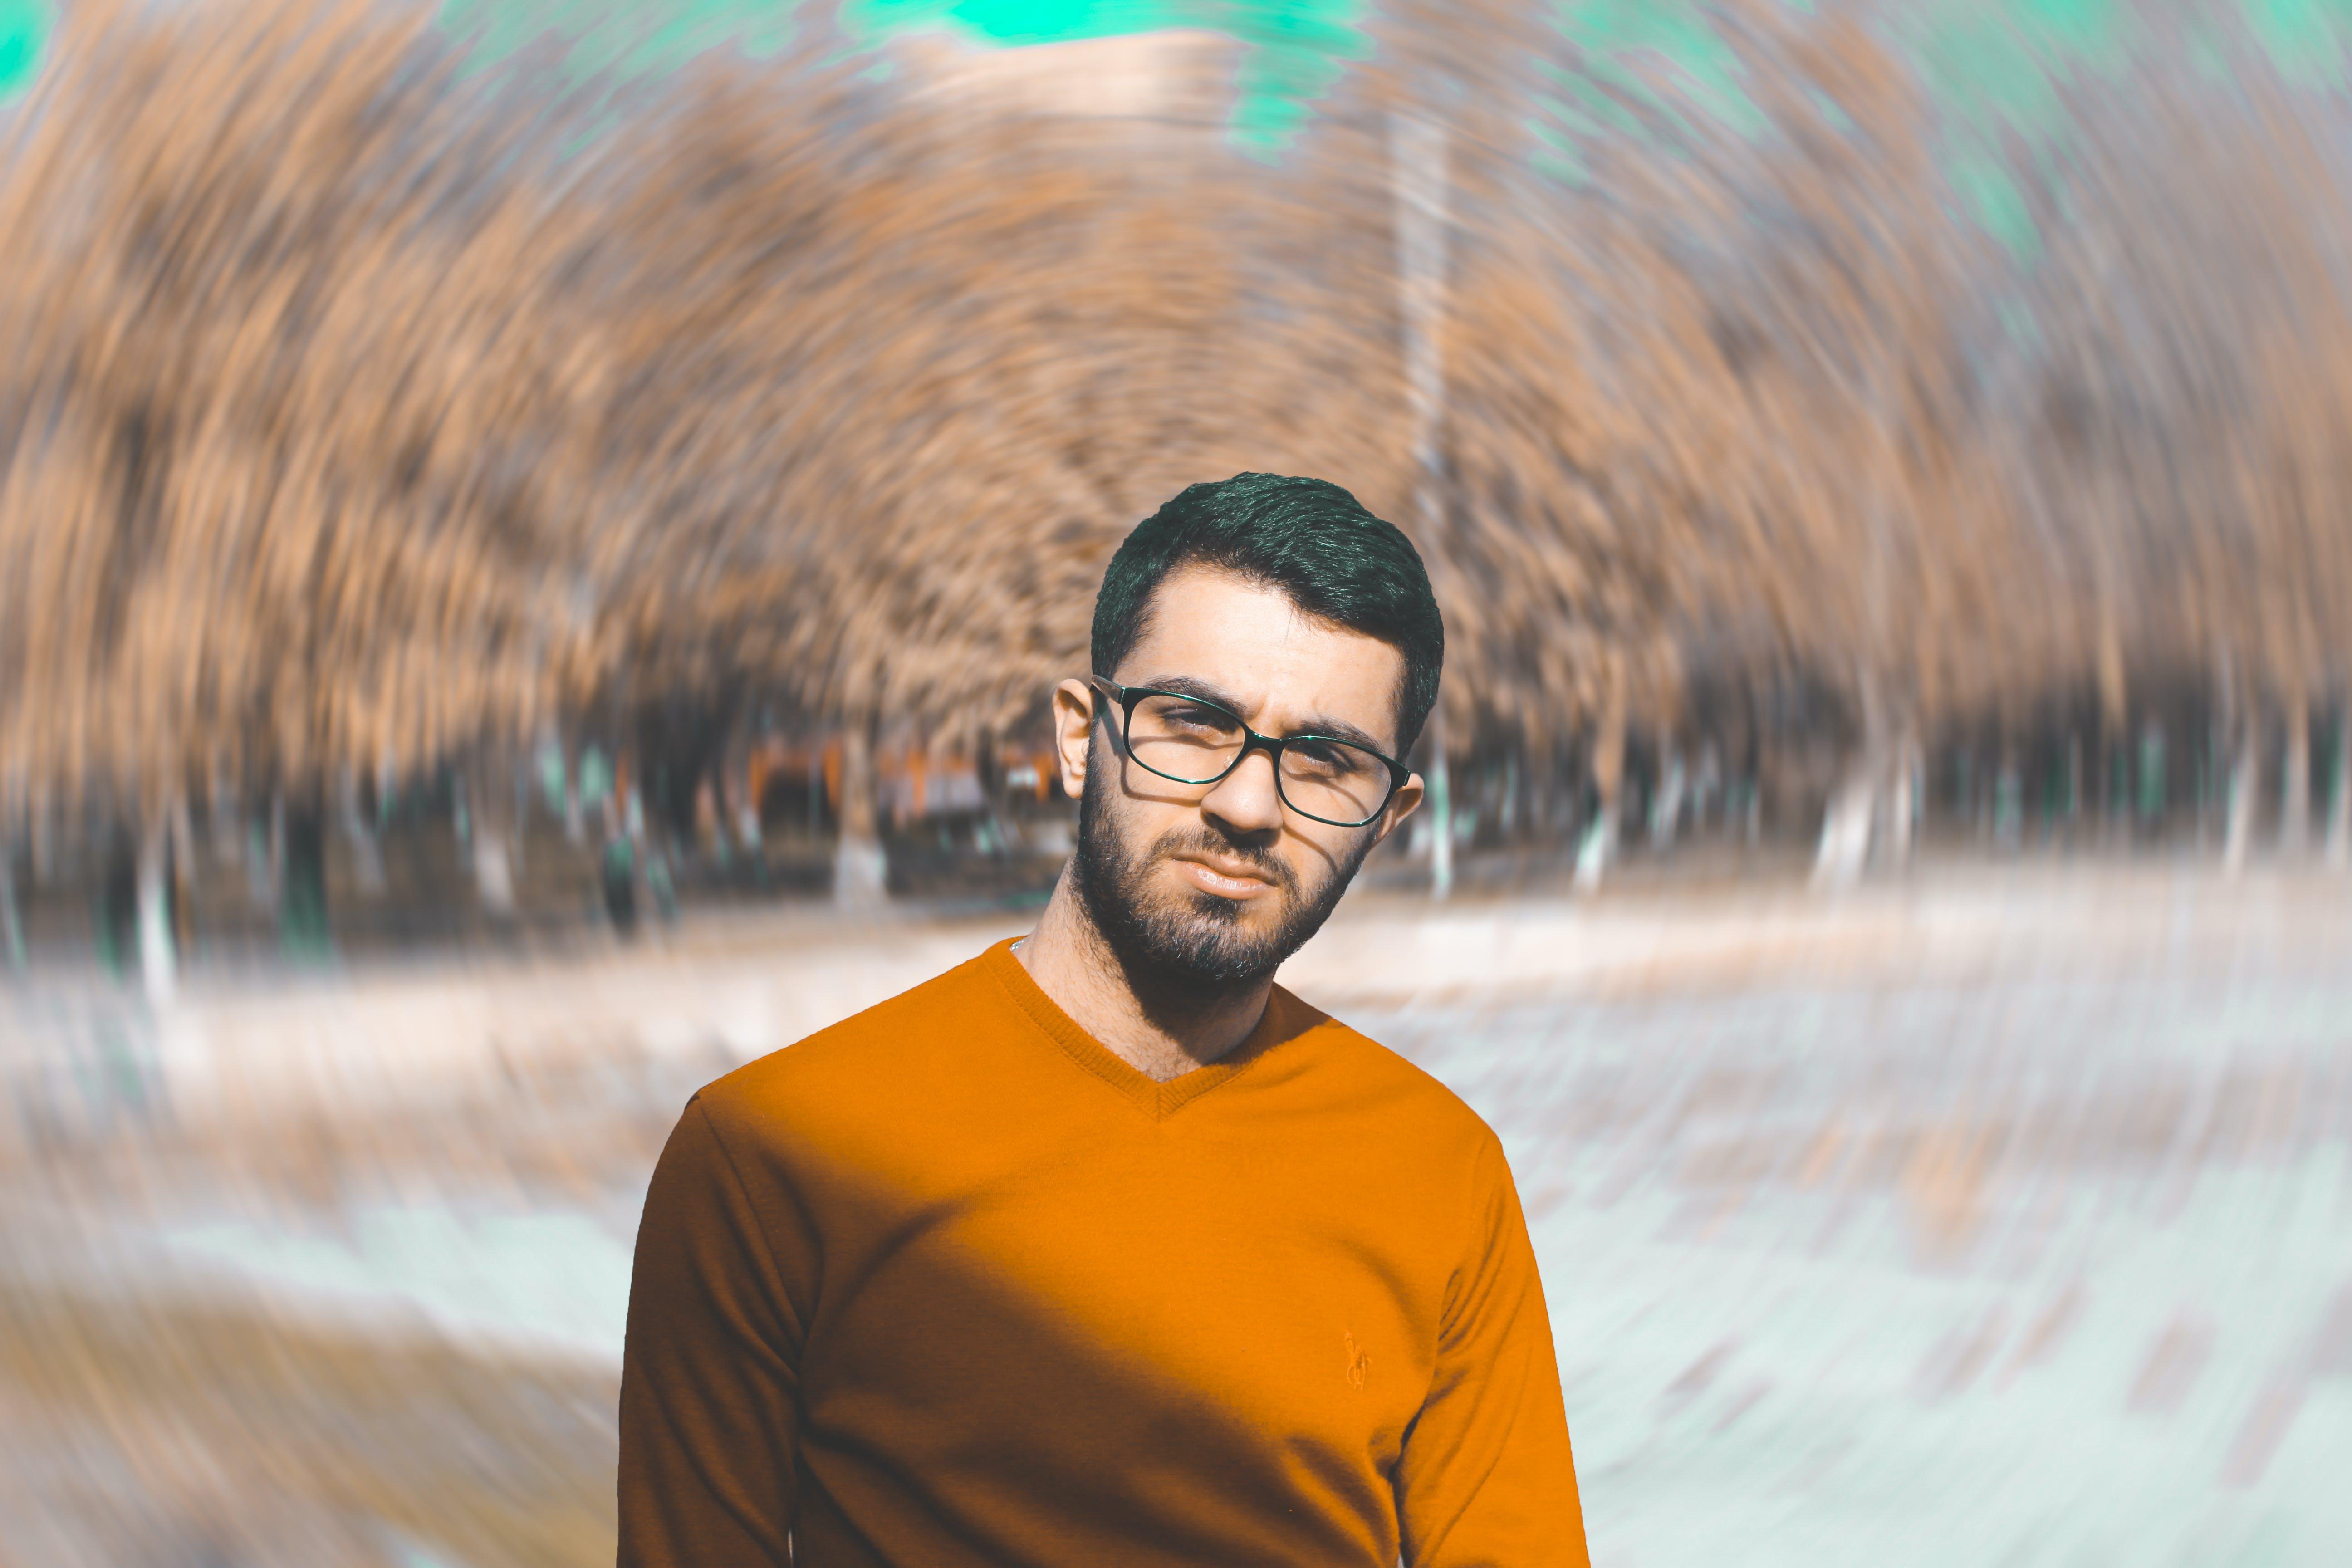 Man in Orange Crew-neck Top